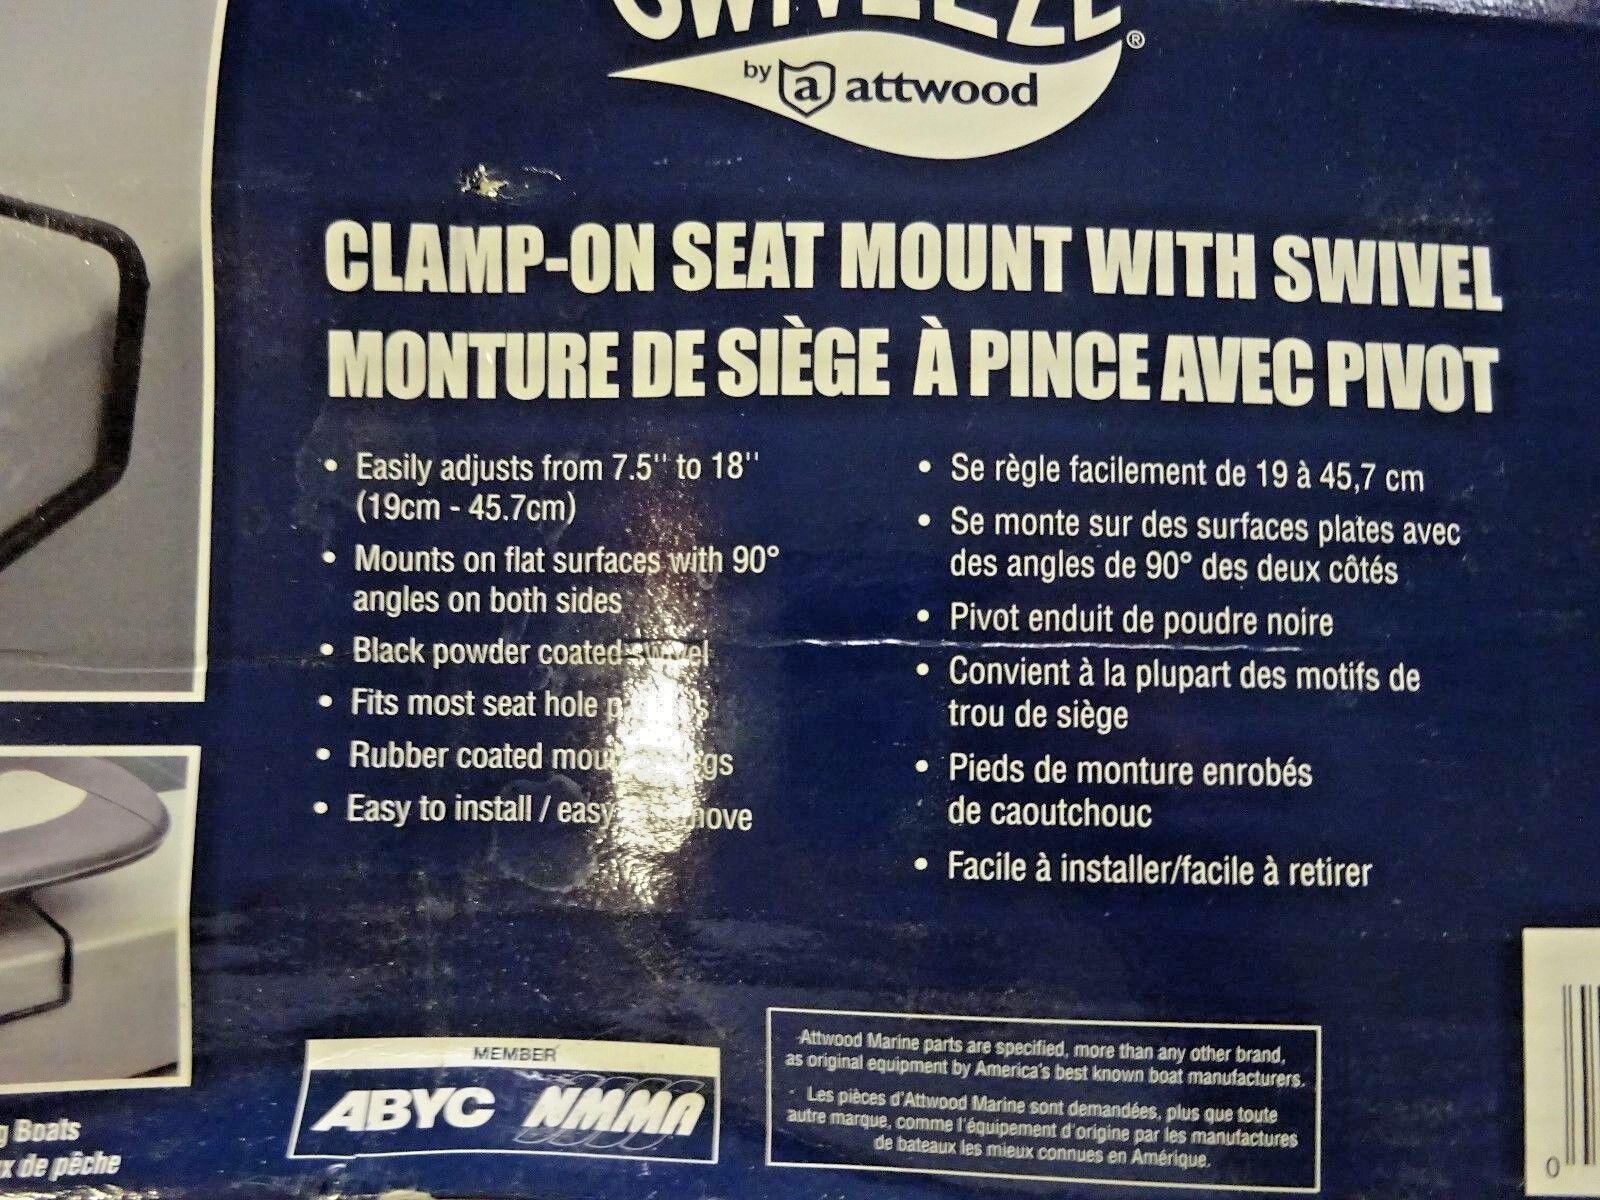 Swivl-Eze 15700-3 Clamp on Boat Seat Swivel